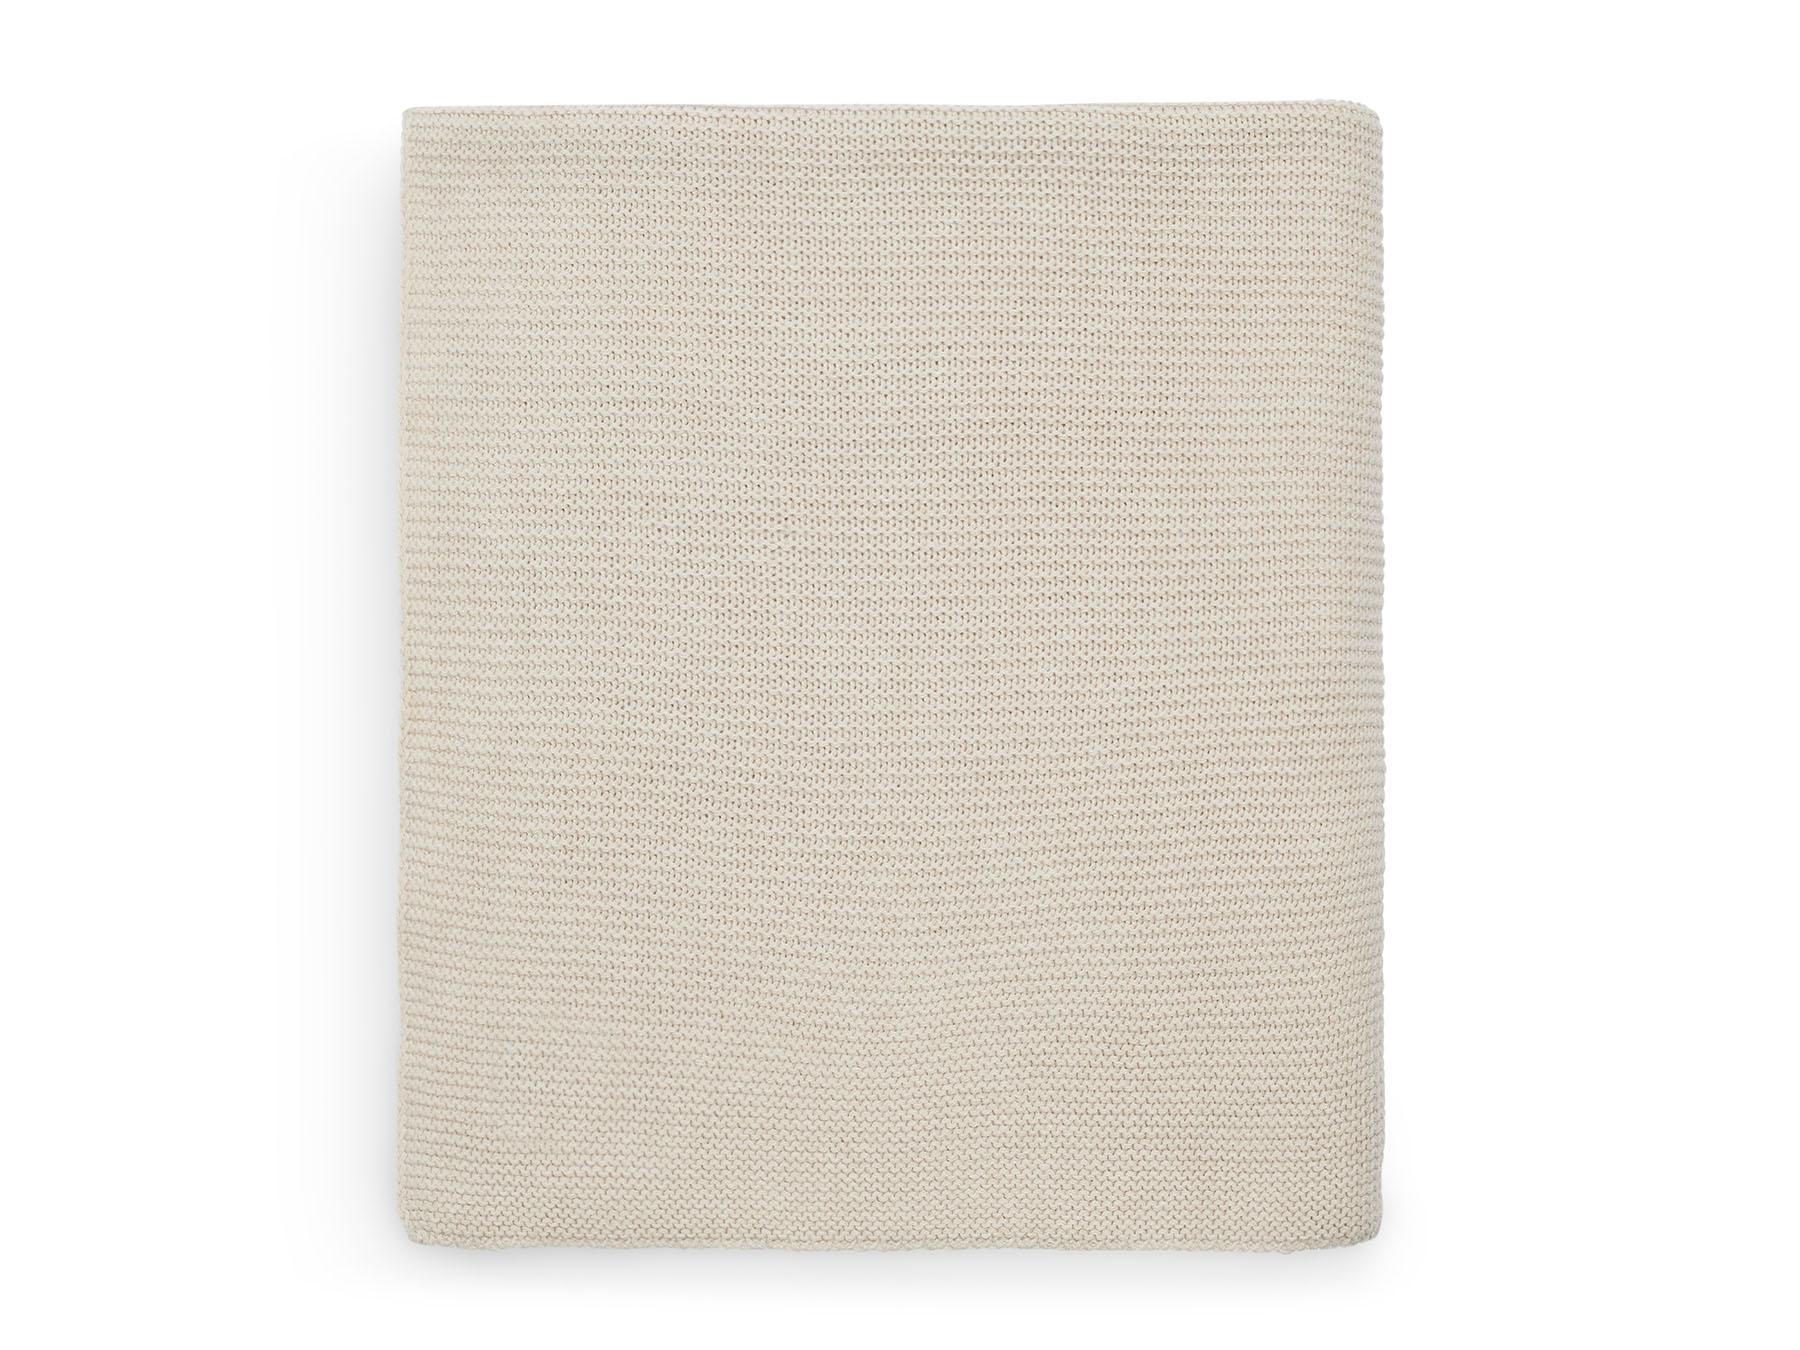 Babydecke Strickdecke Basic knit Nougat cremebeige (Gr. 75x100 cm)